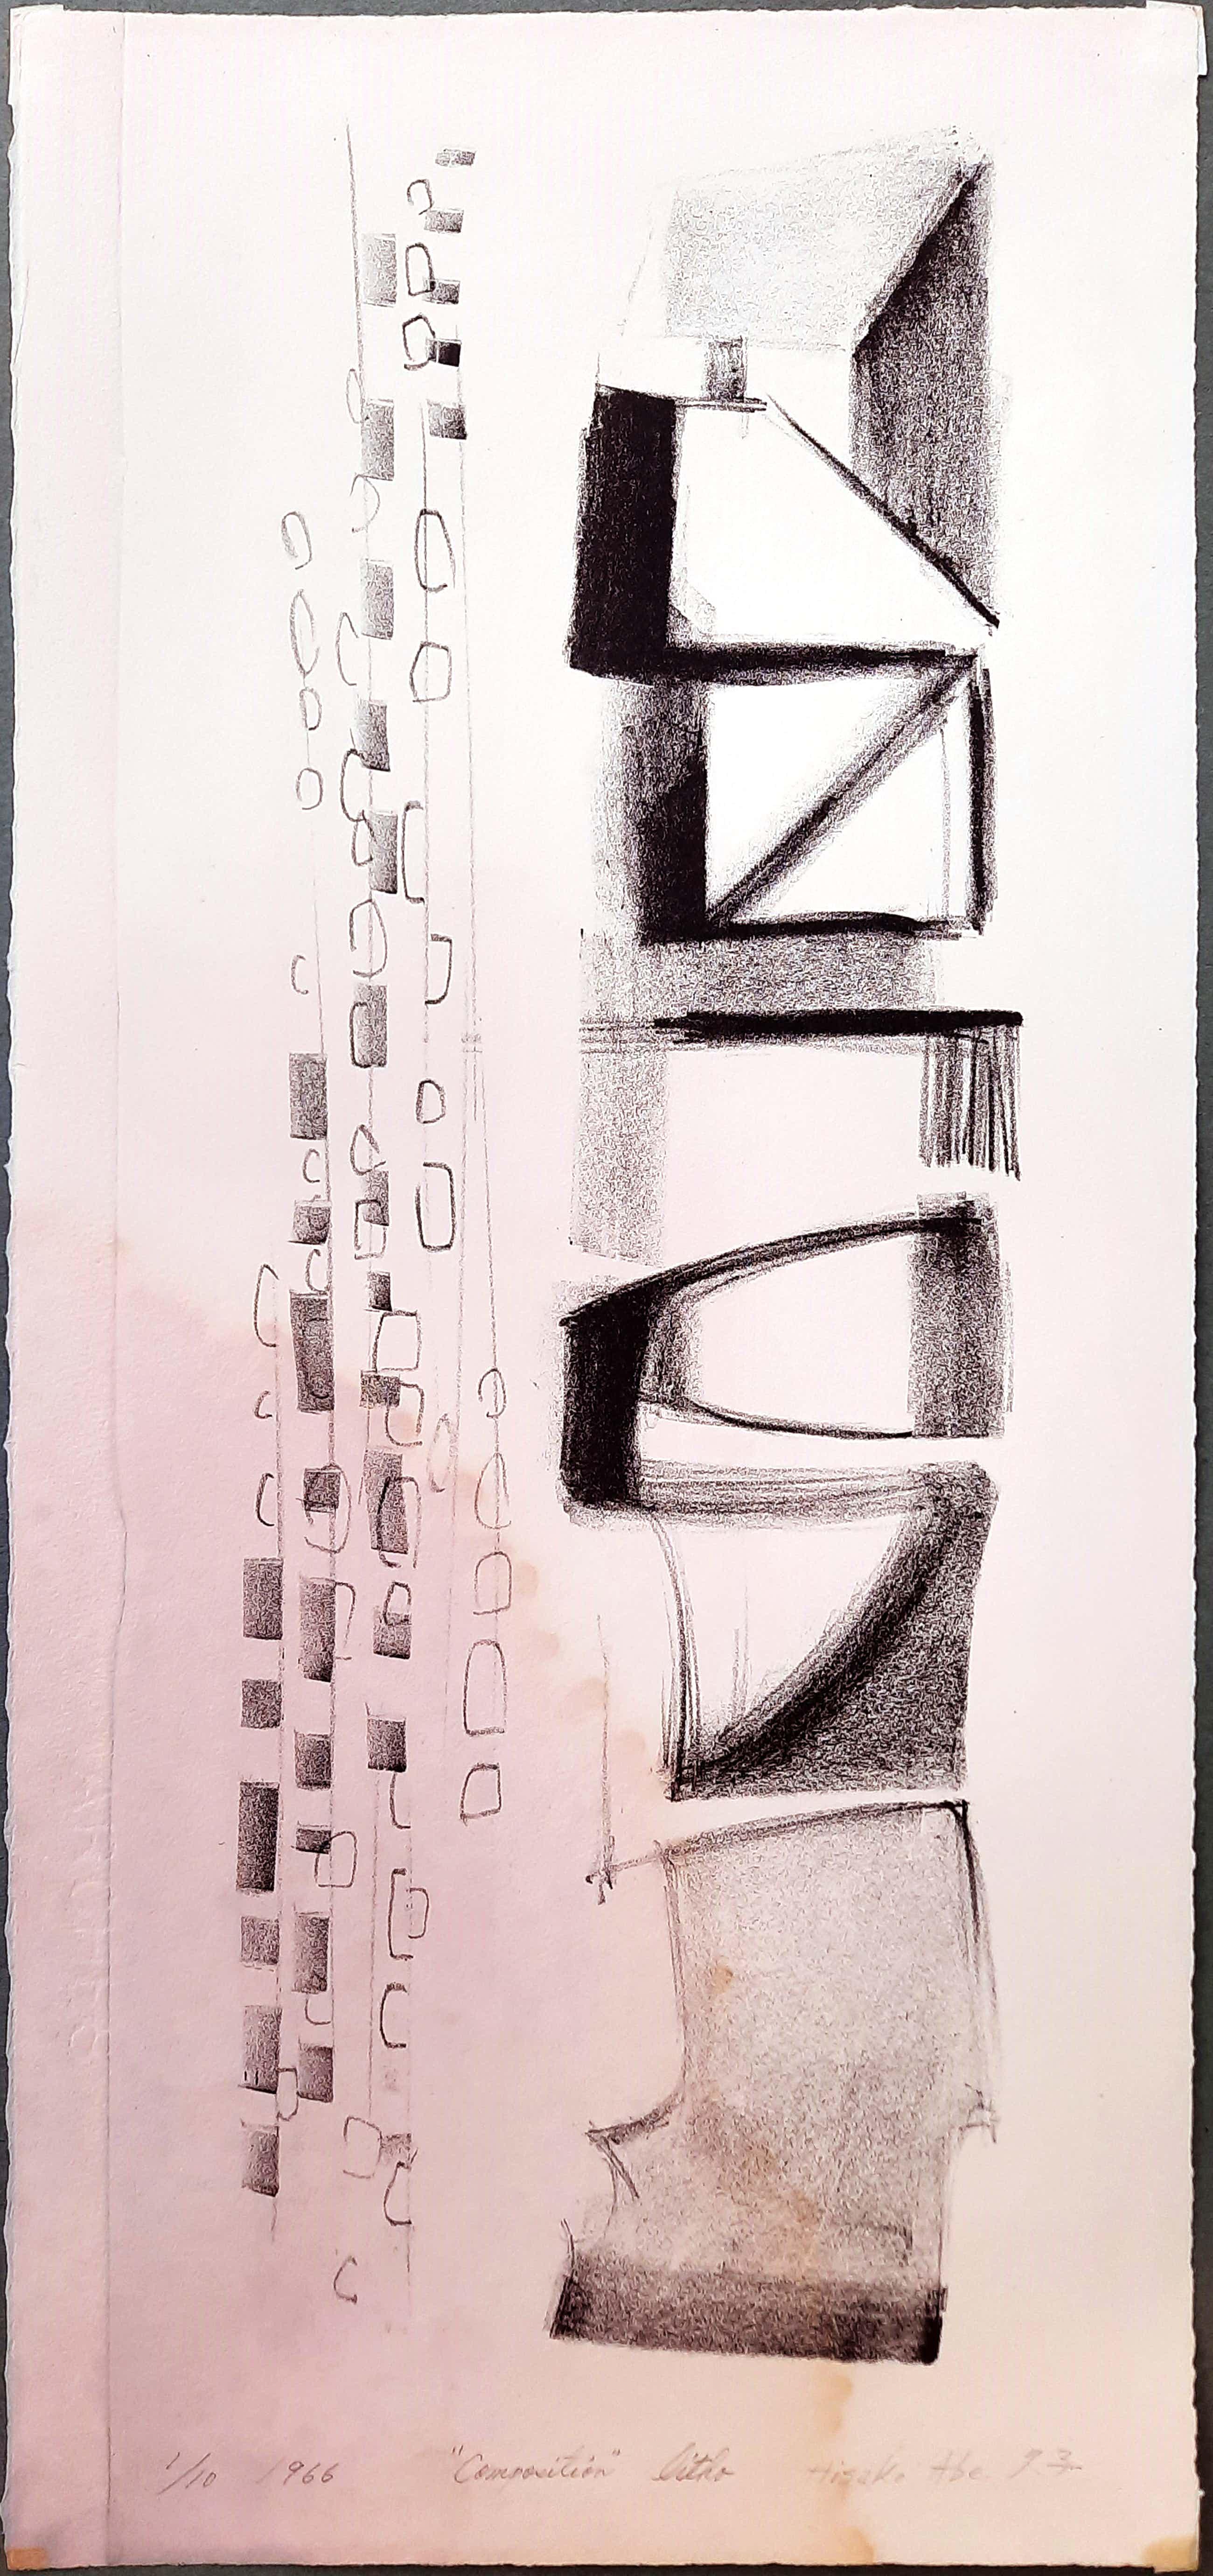 Hisako Viruly Abe - abstracte steendruk - Composition 1/10 kopen? Bied vanaf 1!